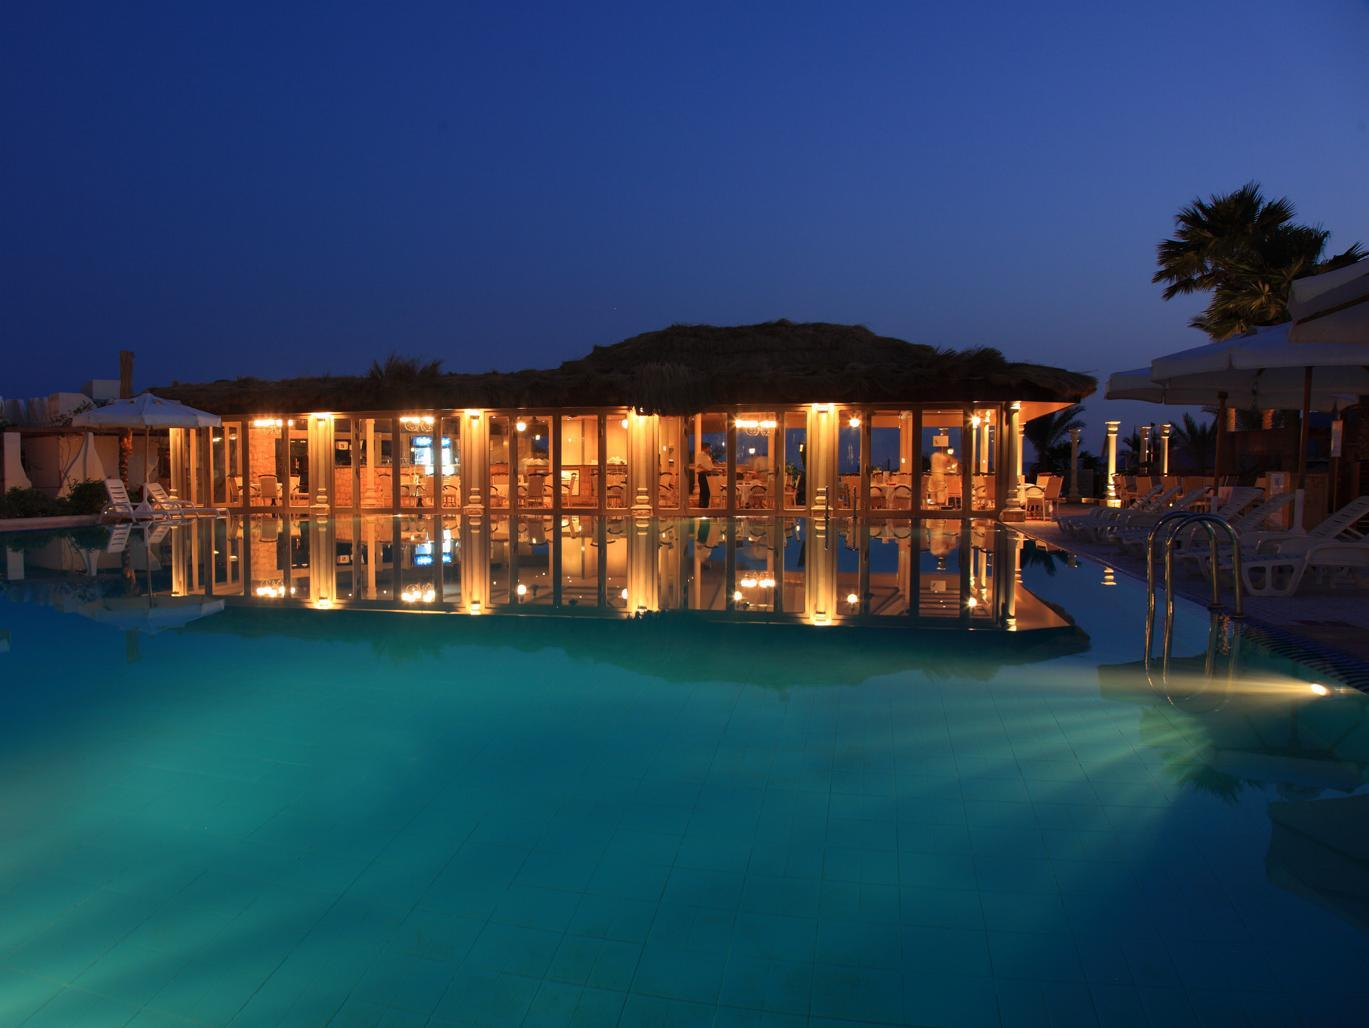 Swiss Inn Resort Dahab - Dahab, Egypt - Great discounted rates!